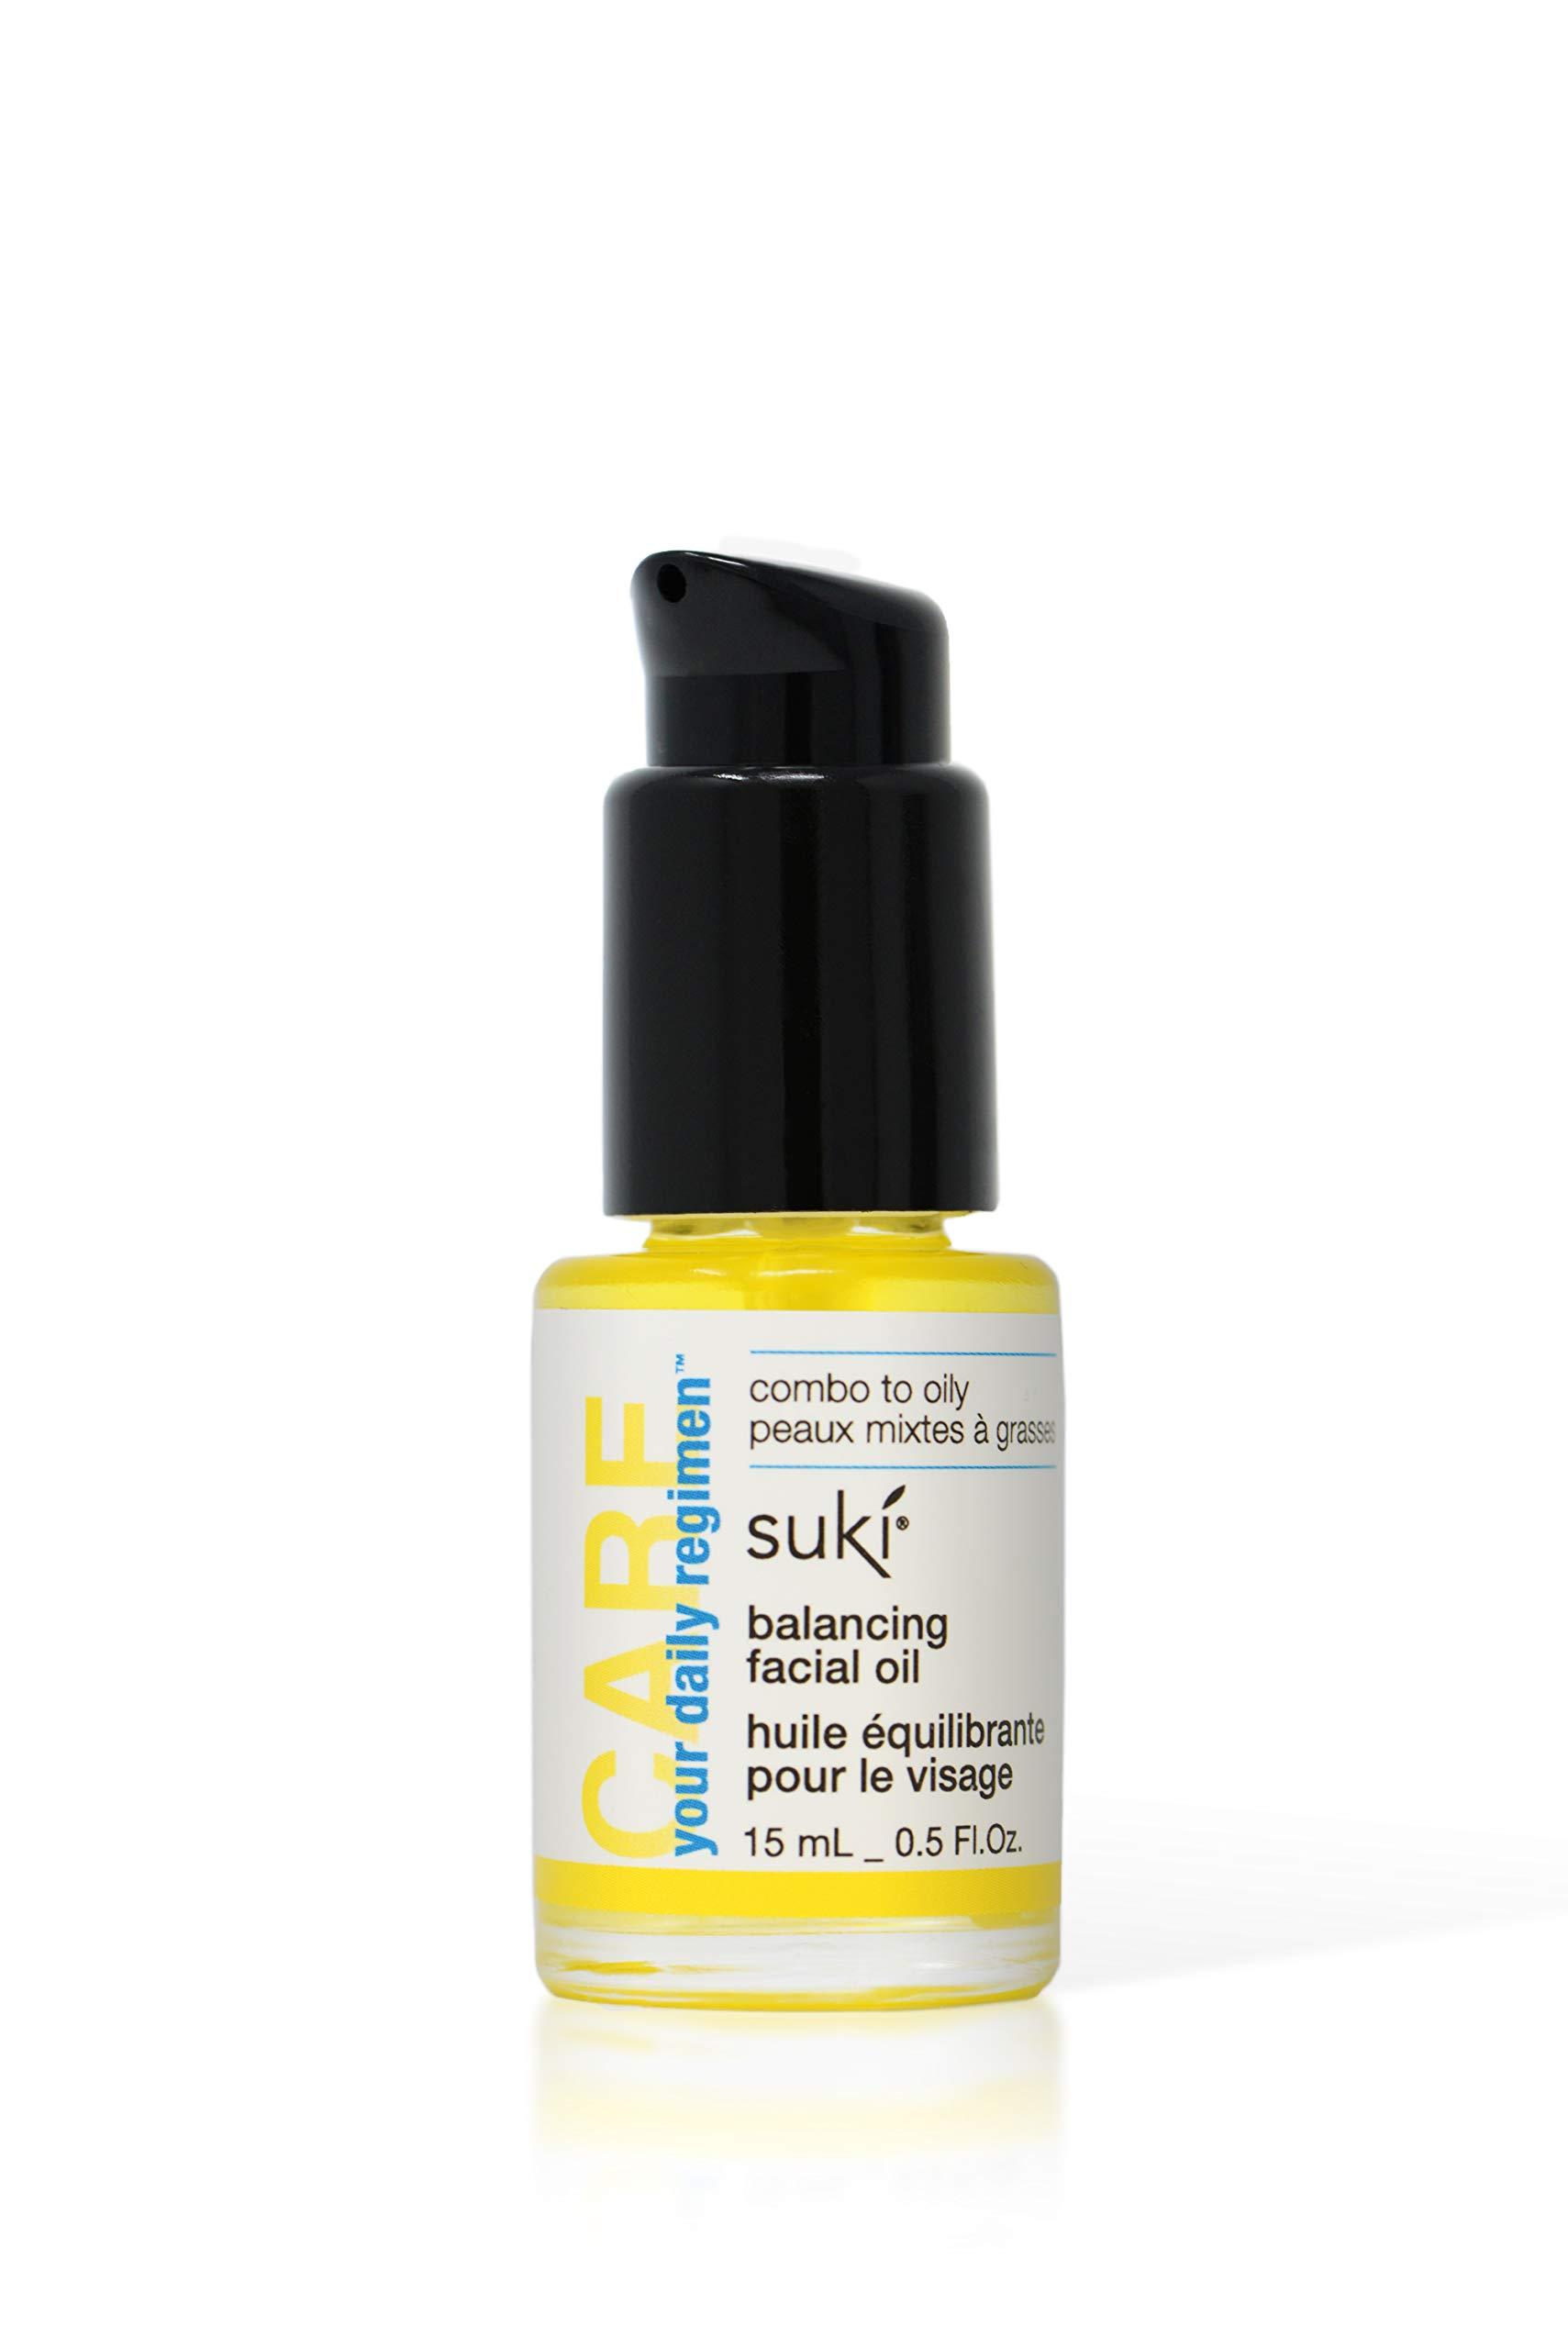 Suki Skincare Balancing Facial Oil - With Organic Jojoba Oil, Lavender, Chamomile, and Calendula - Sebum Equalizing Complexes Calm & Sooth Skin - 15 ml